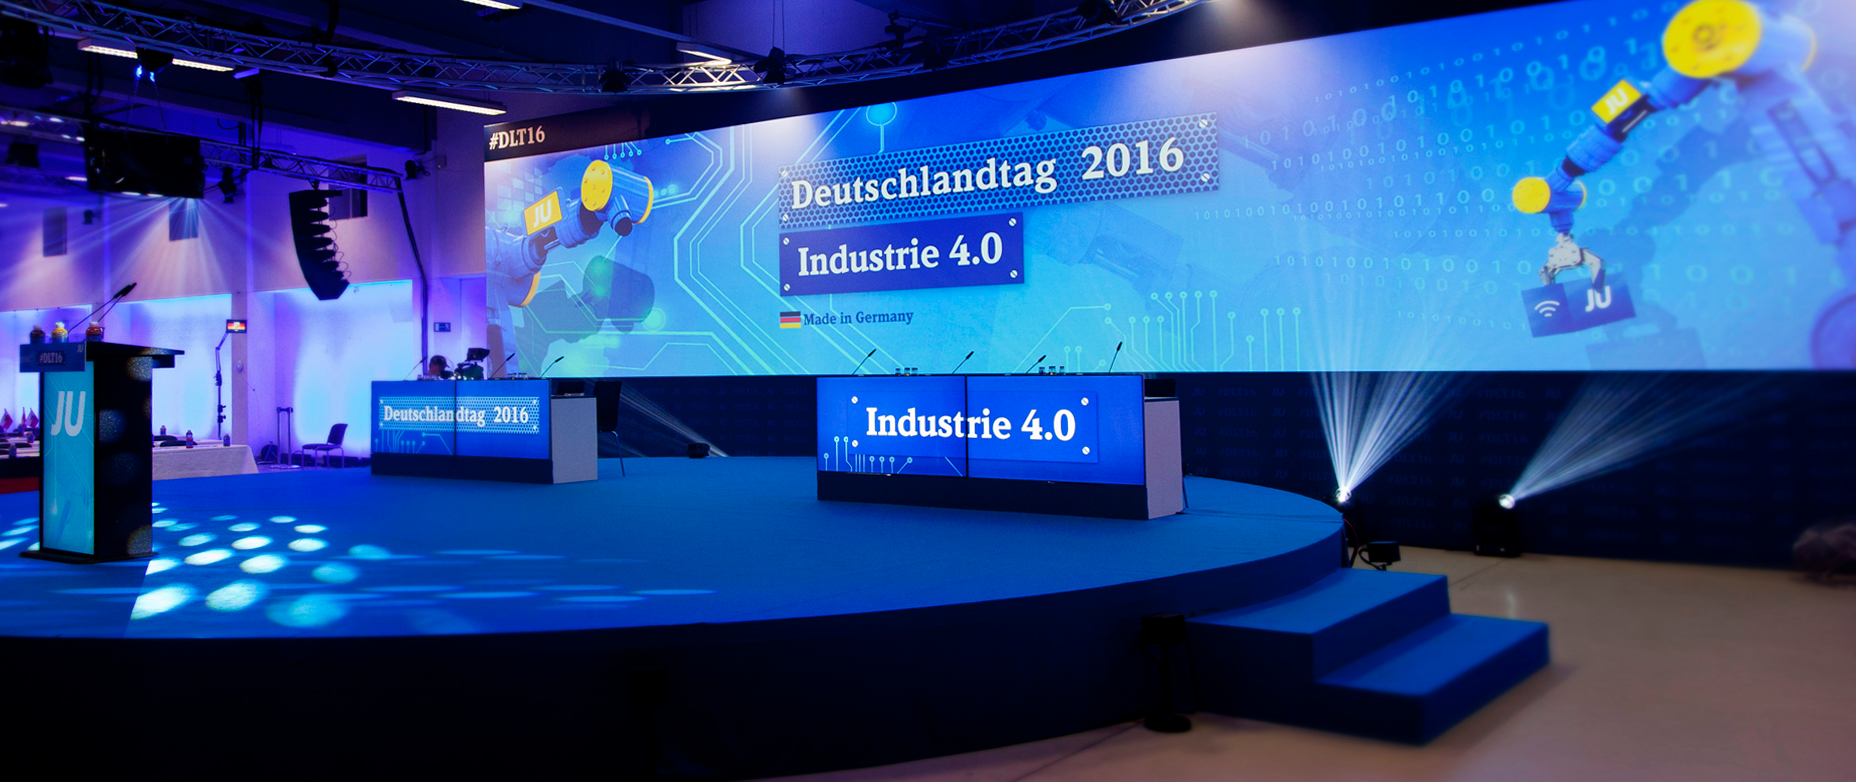 Deutschlandtag 2016 – Panoramadisplay